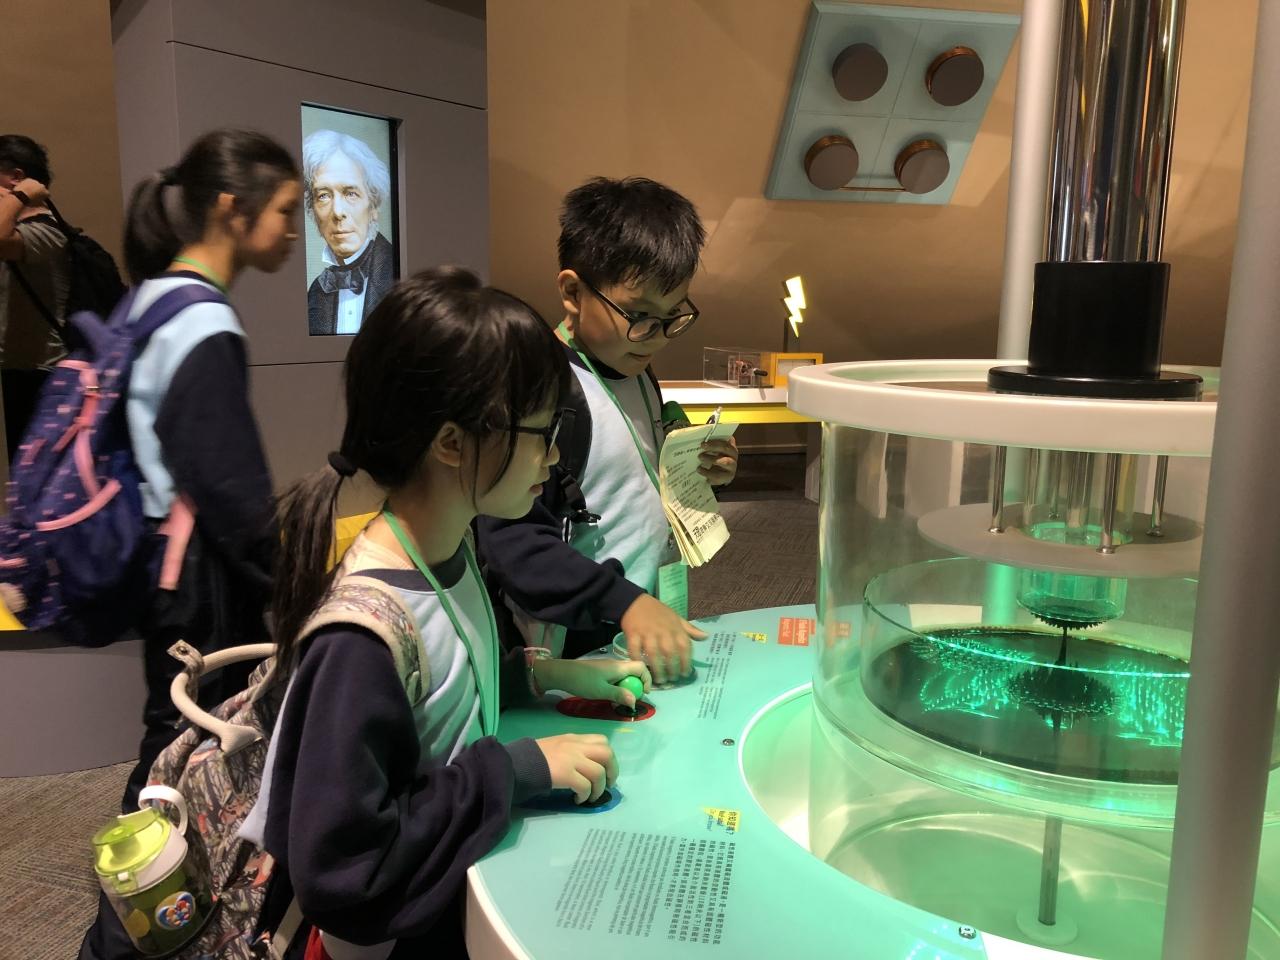 http://keito.school.hk/sites/default/files/batch_img_0938.jpg